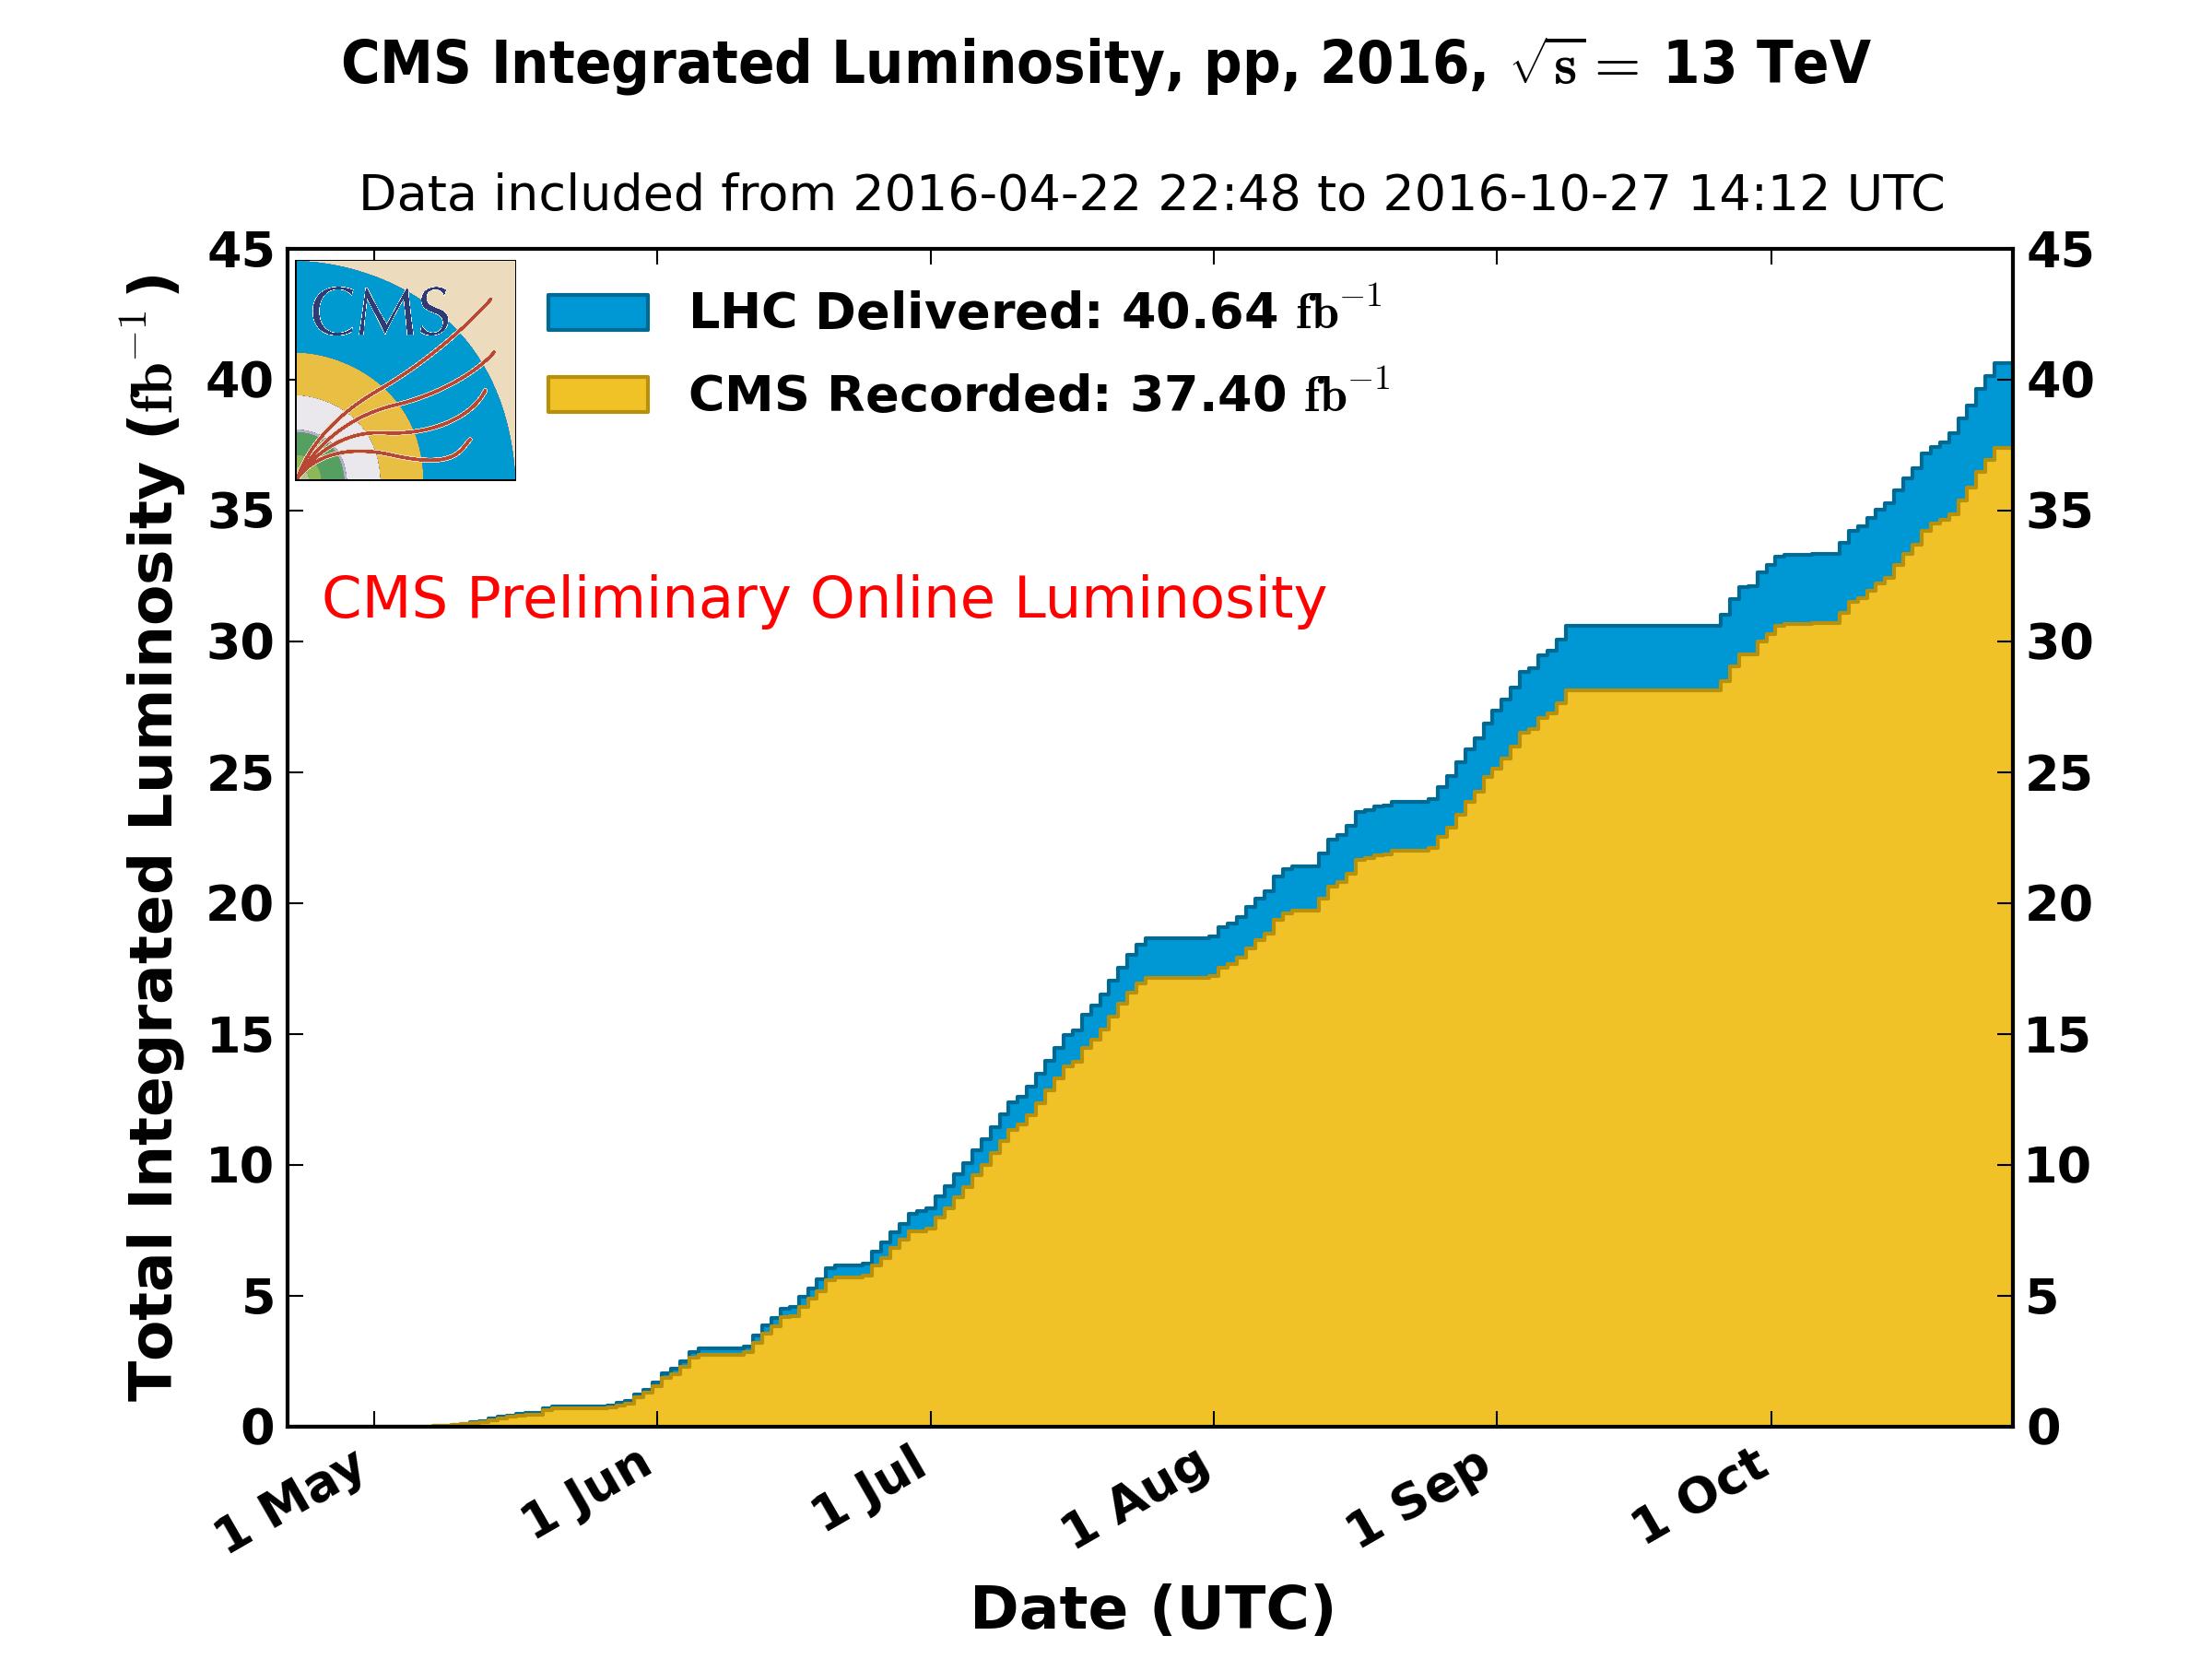 https://cern.ch/cmslumi/publicplots/int_lumi_per_day_cumulative_pp_2016OnlineLumi.png